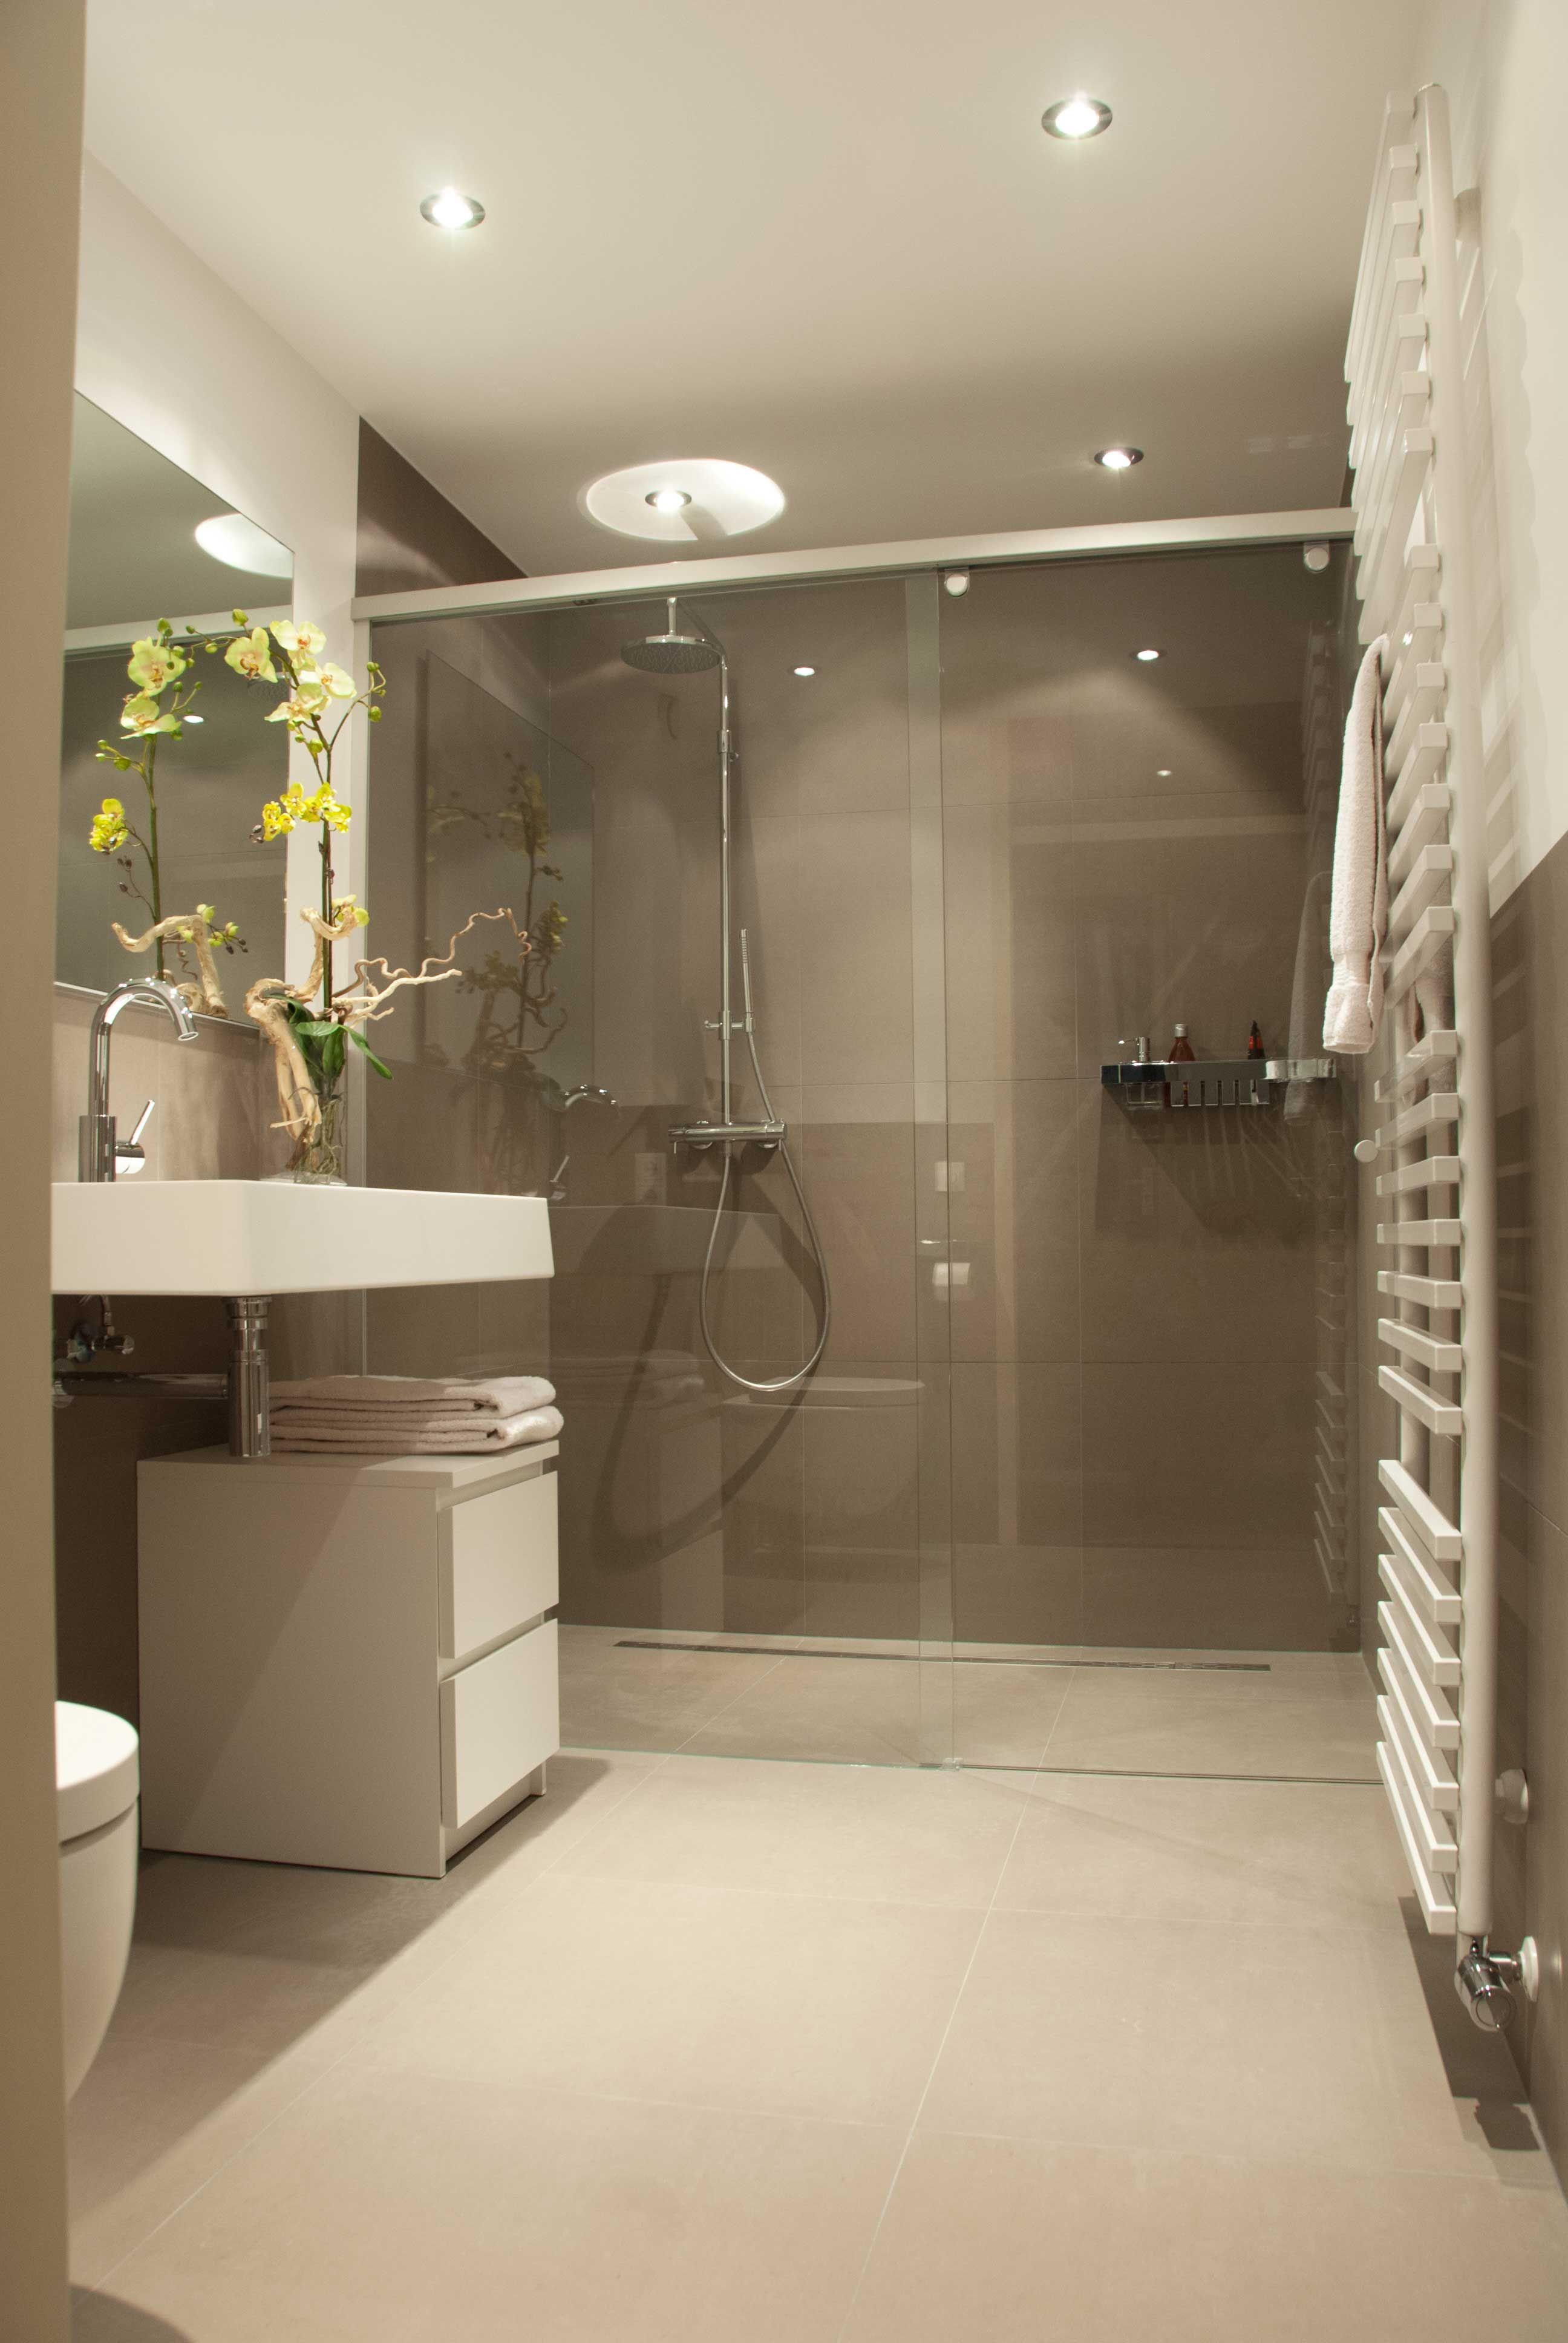 badkamer inspiratie badkamer idee235n pinterest